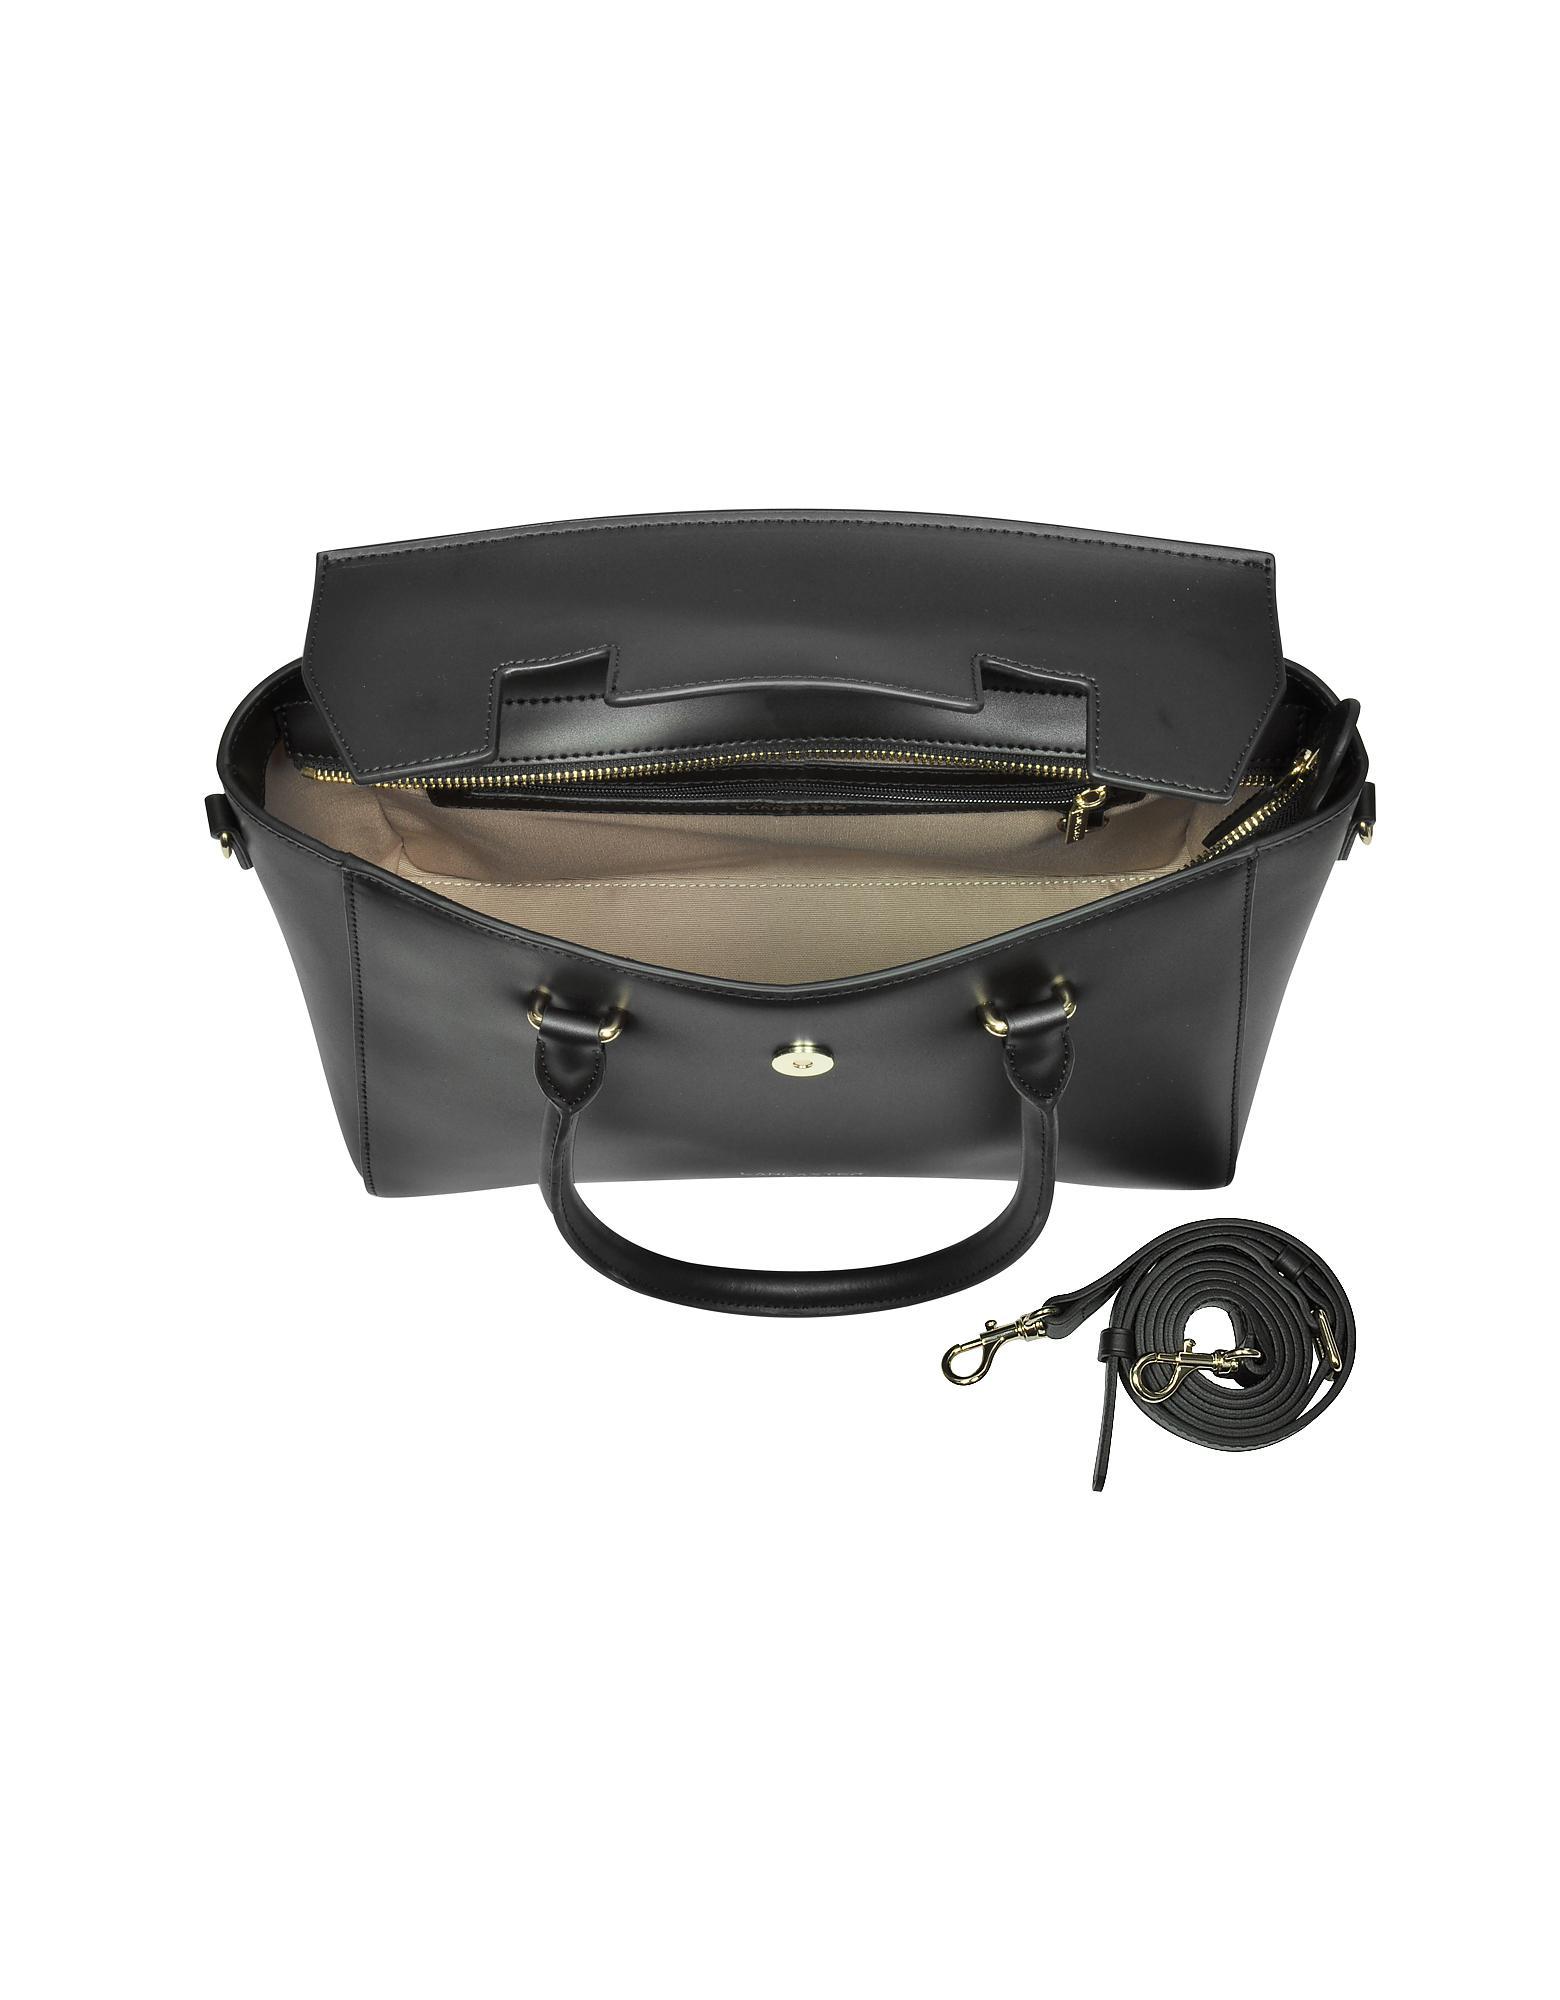 780bf329b997 Lancaster Paris - Black Camelia Leather Tote Bag W detachable Shoulder  Strap - Lyst. View fullscreen